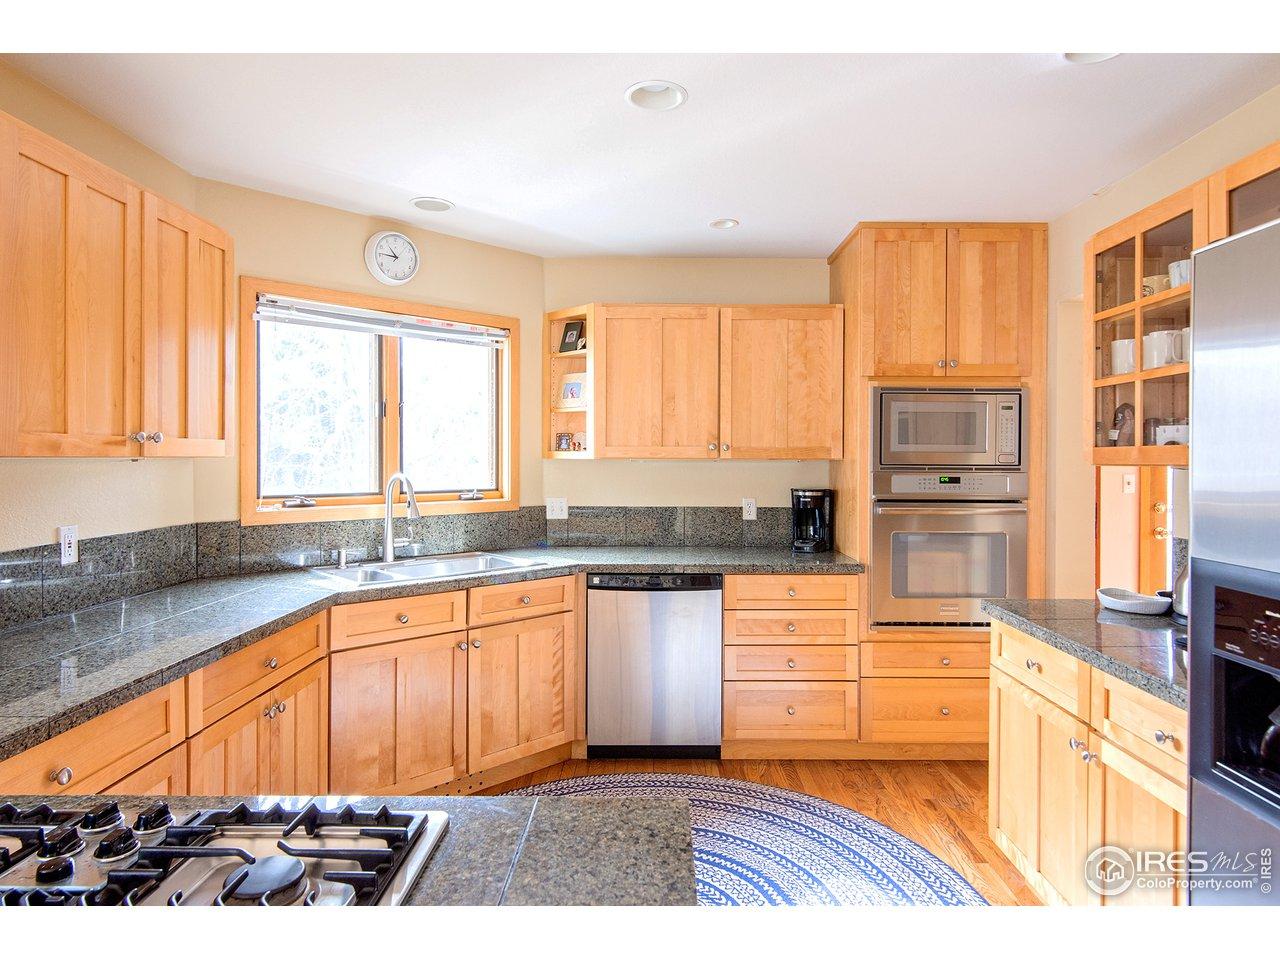 BIG kitchen area